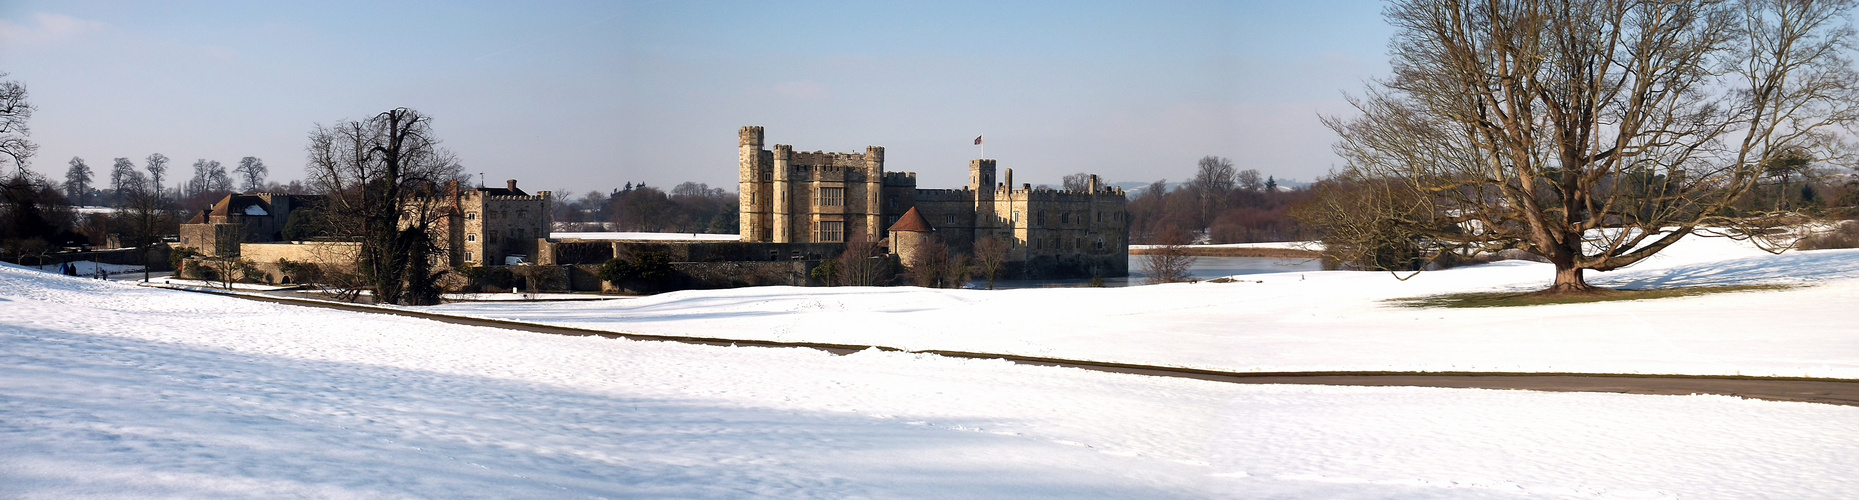 Leeds Castle - Welcome to England